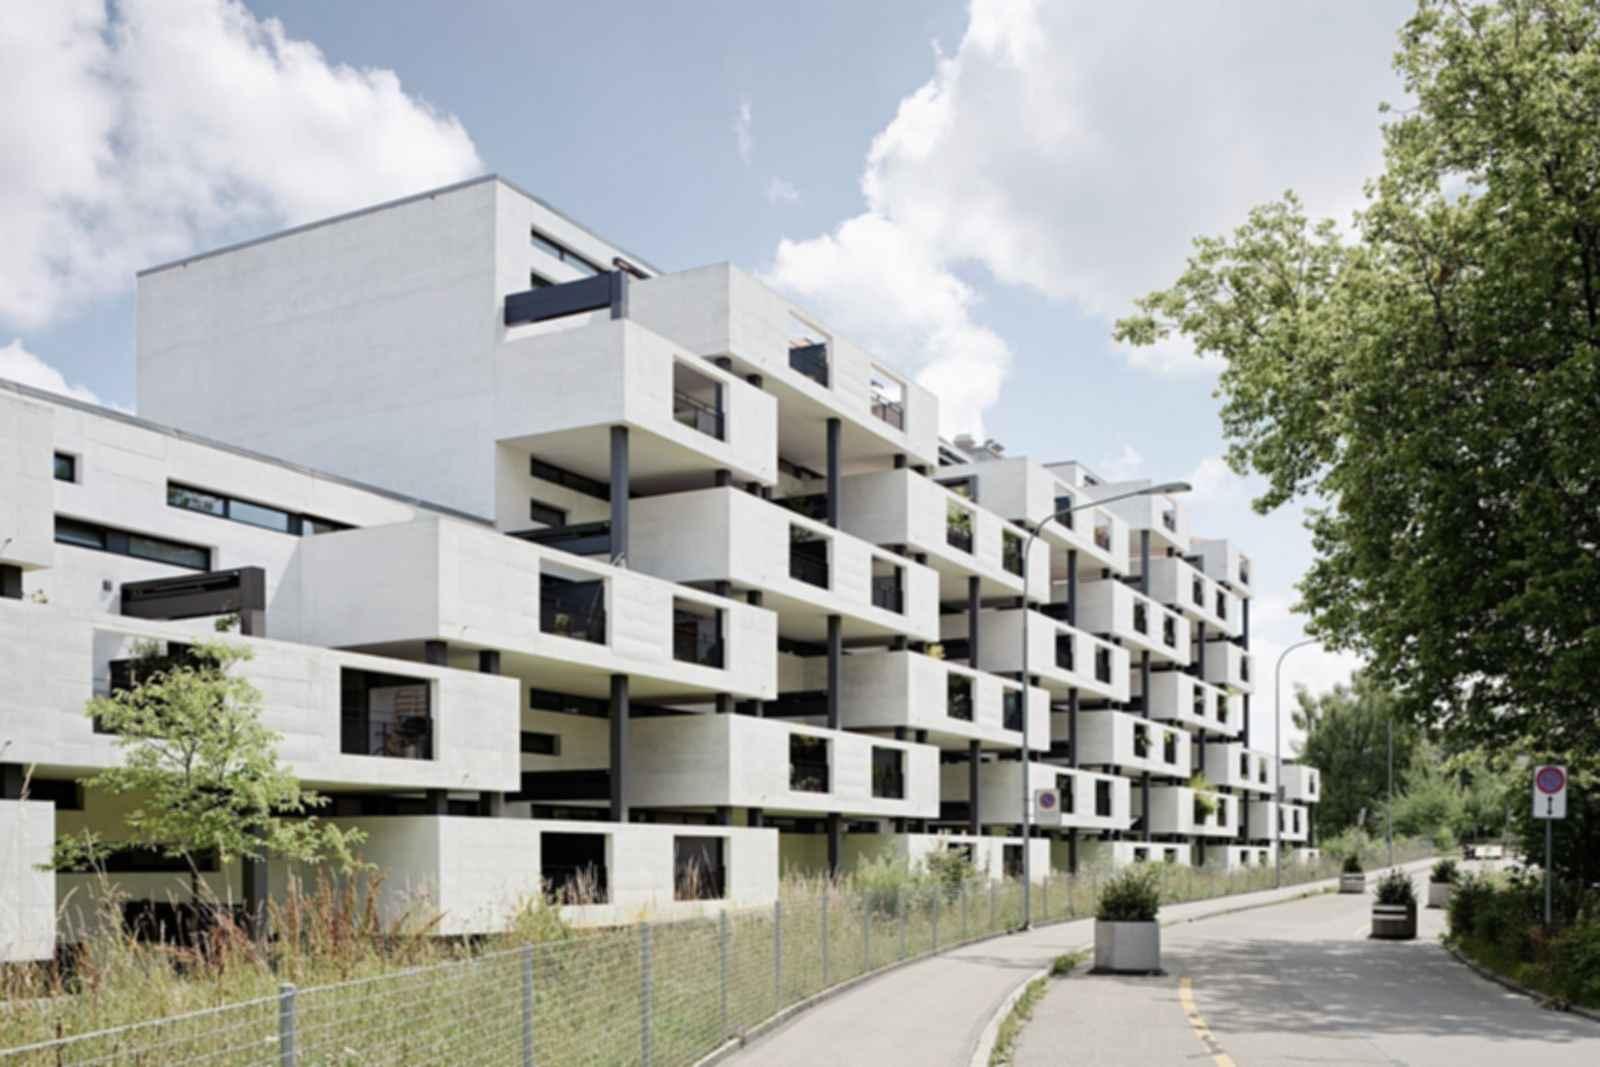 Paul Clairmont Strasse Housing - Exterior/Street View